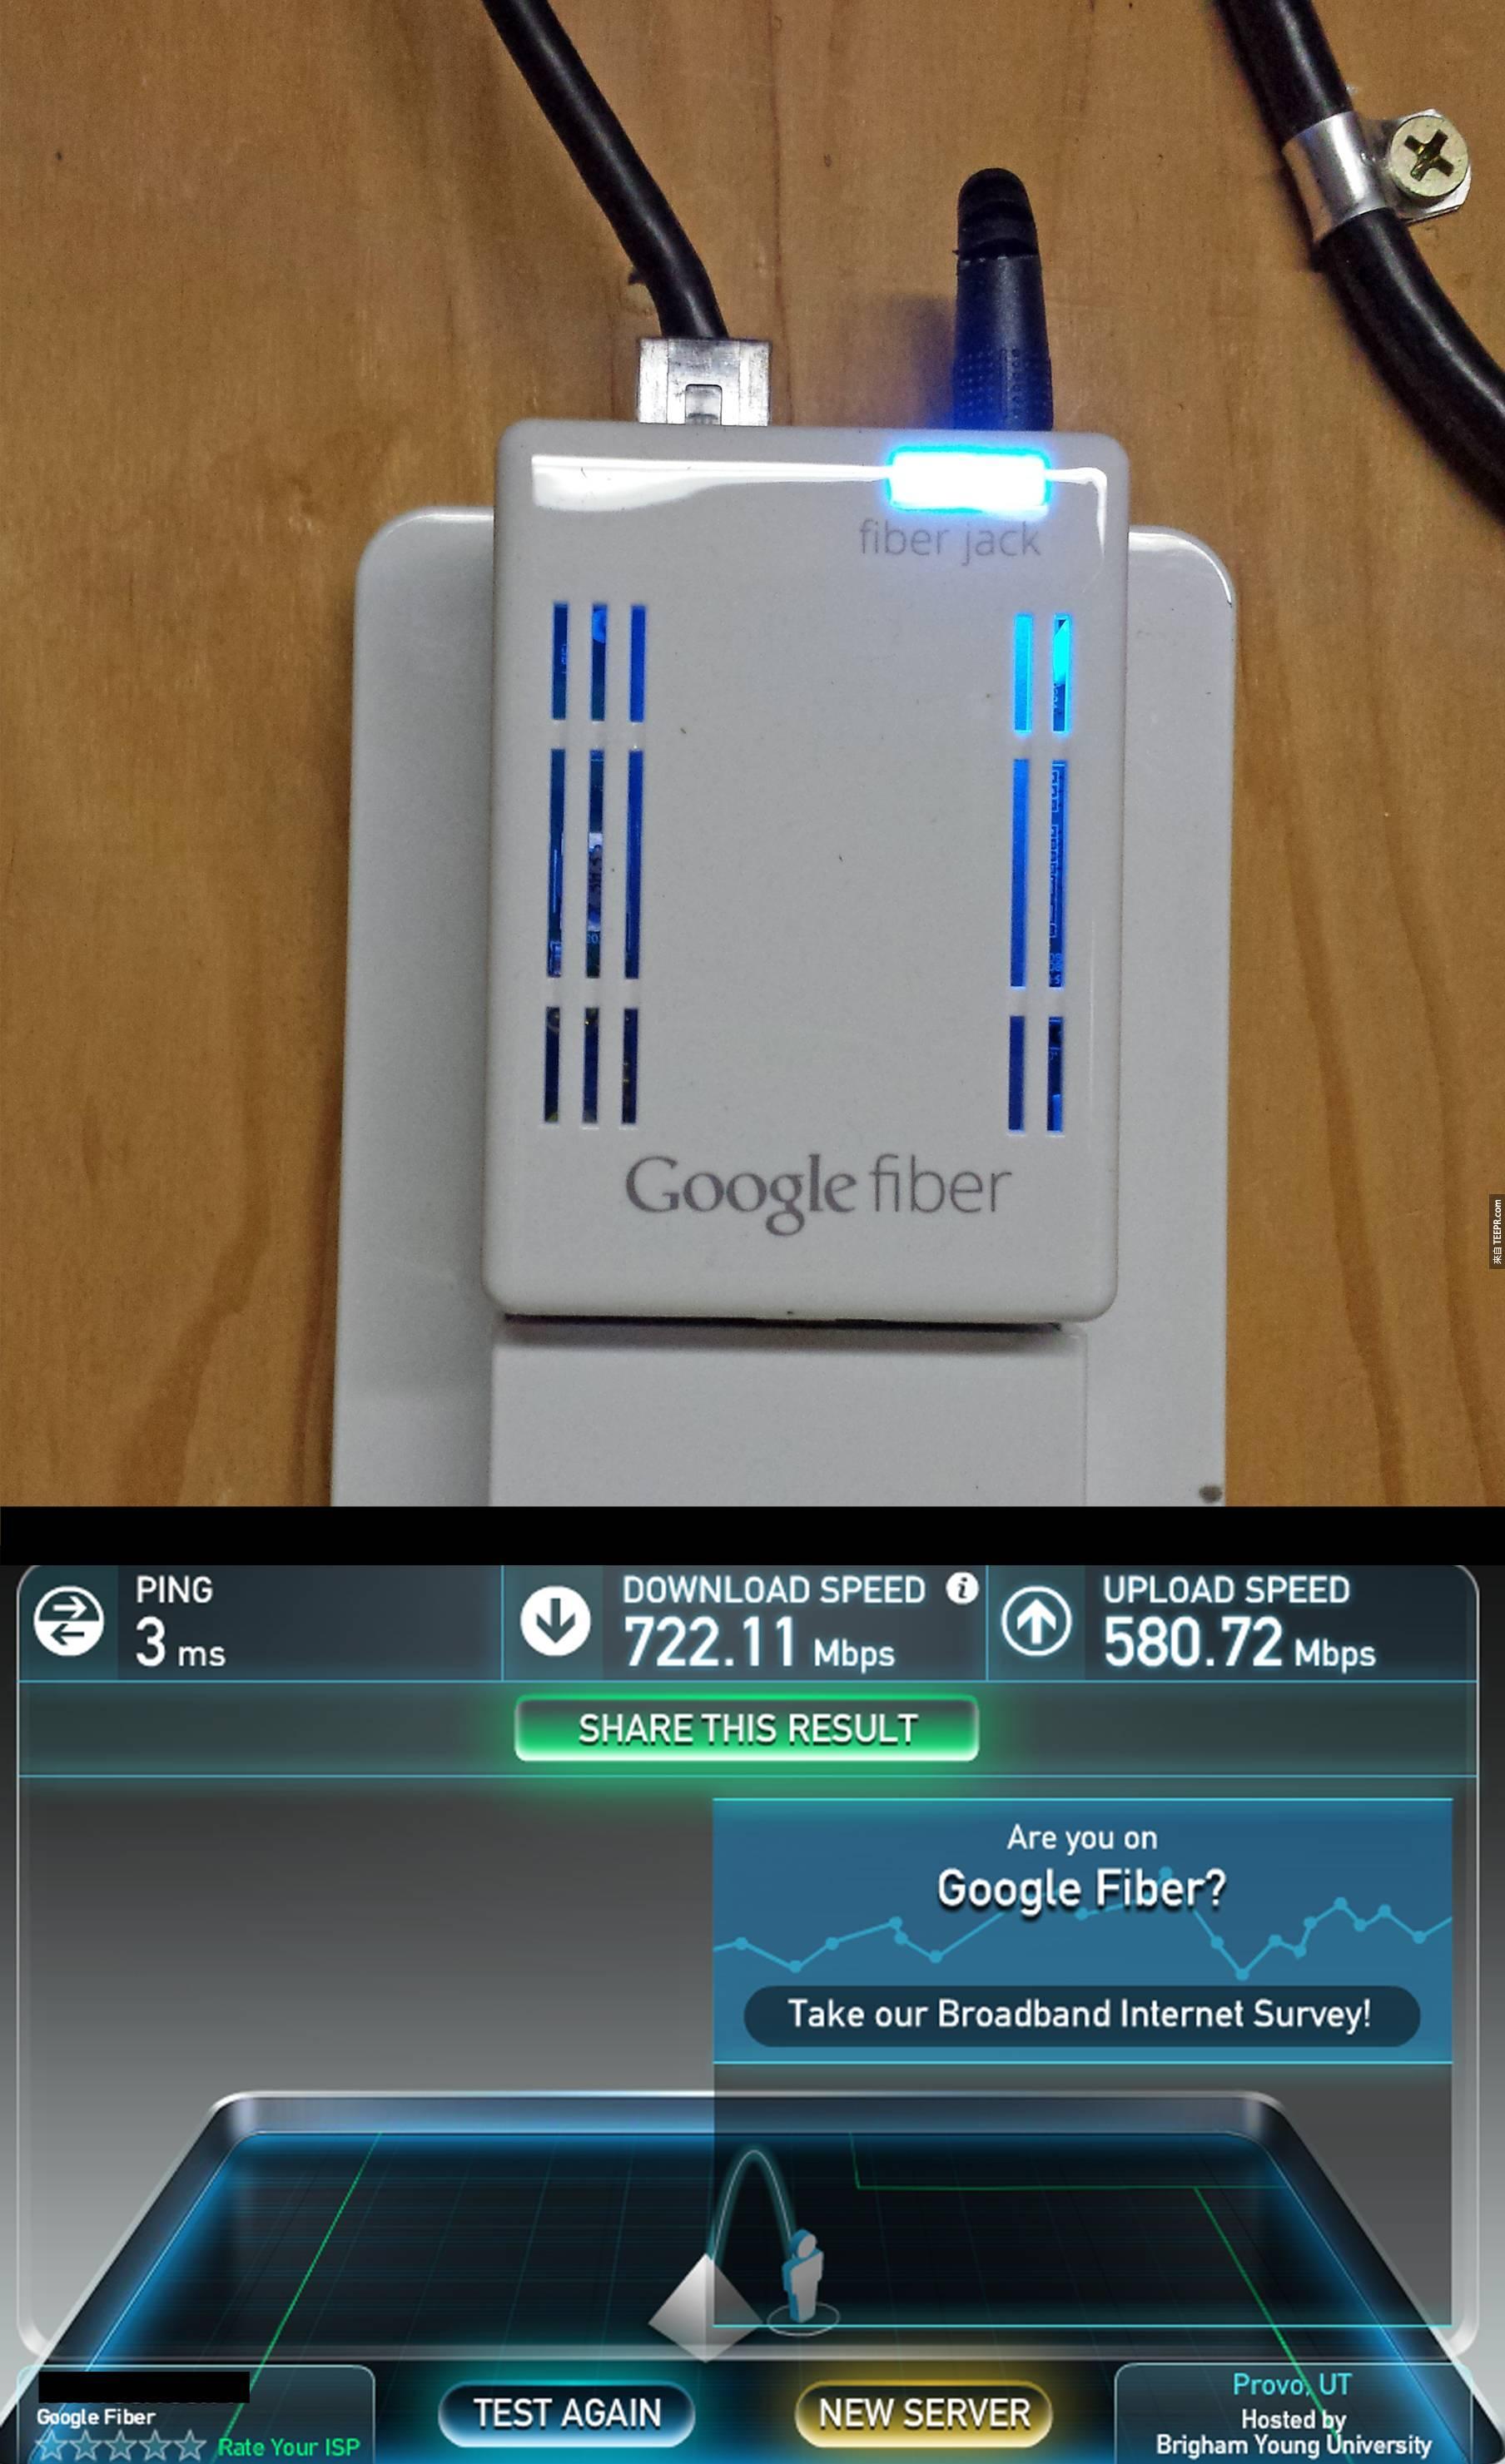 7. Google光纤 (Google Fiber) = 速度快到你以后下载任何东西都不会超过几秒。